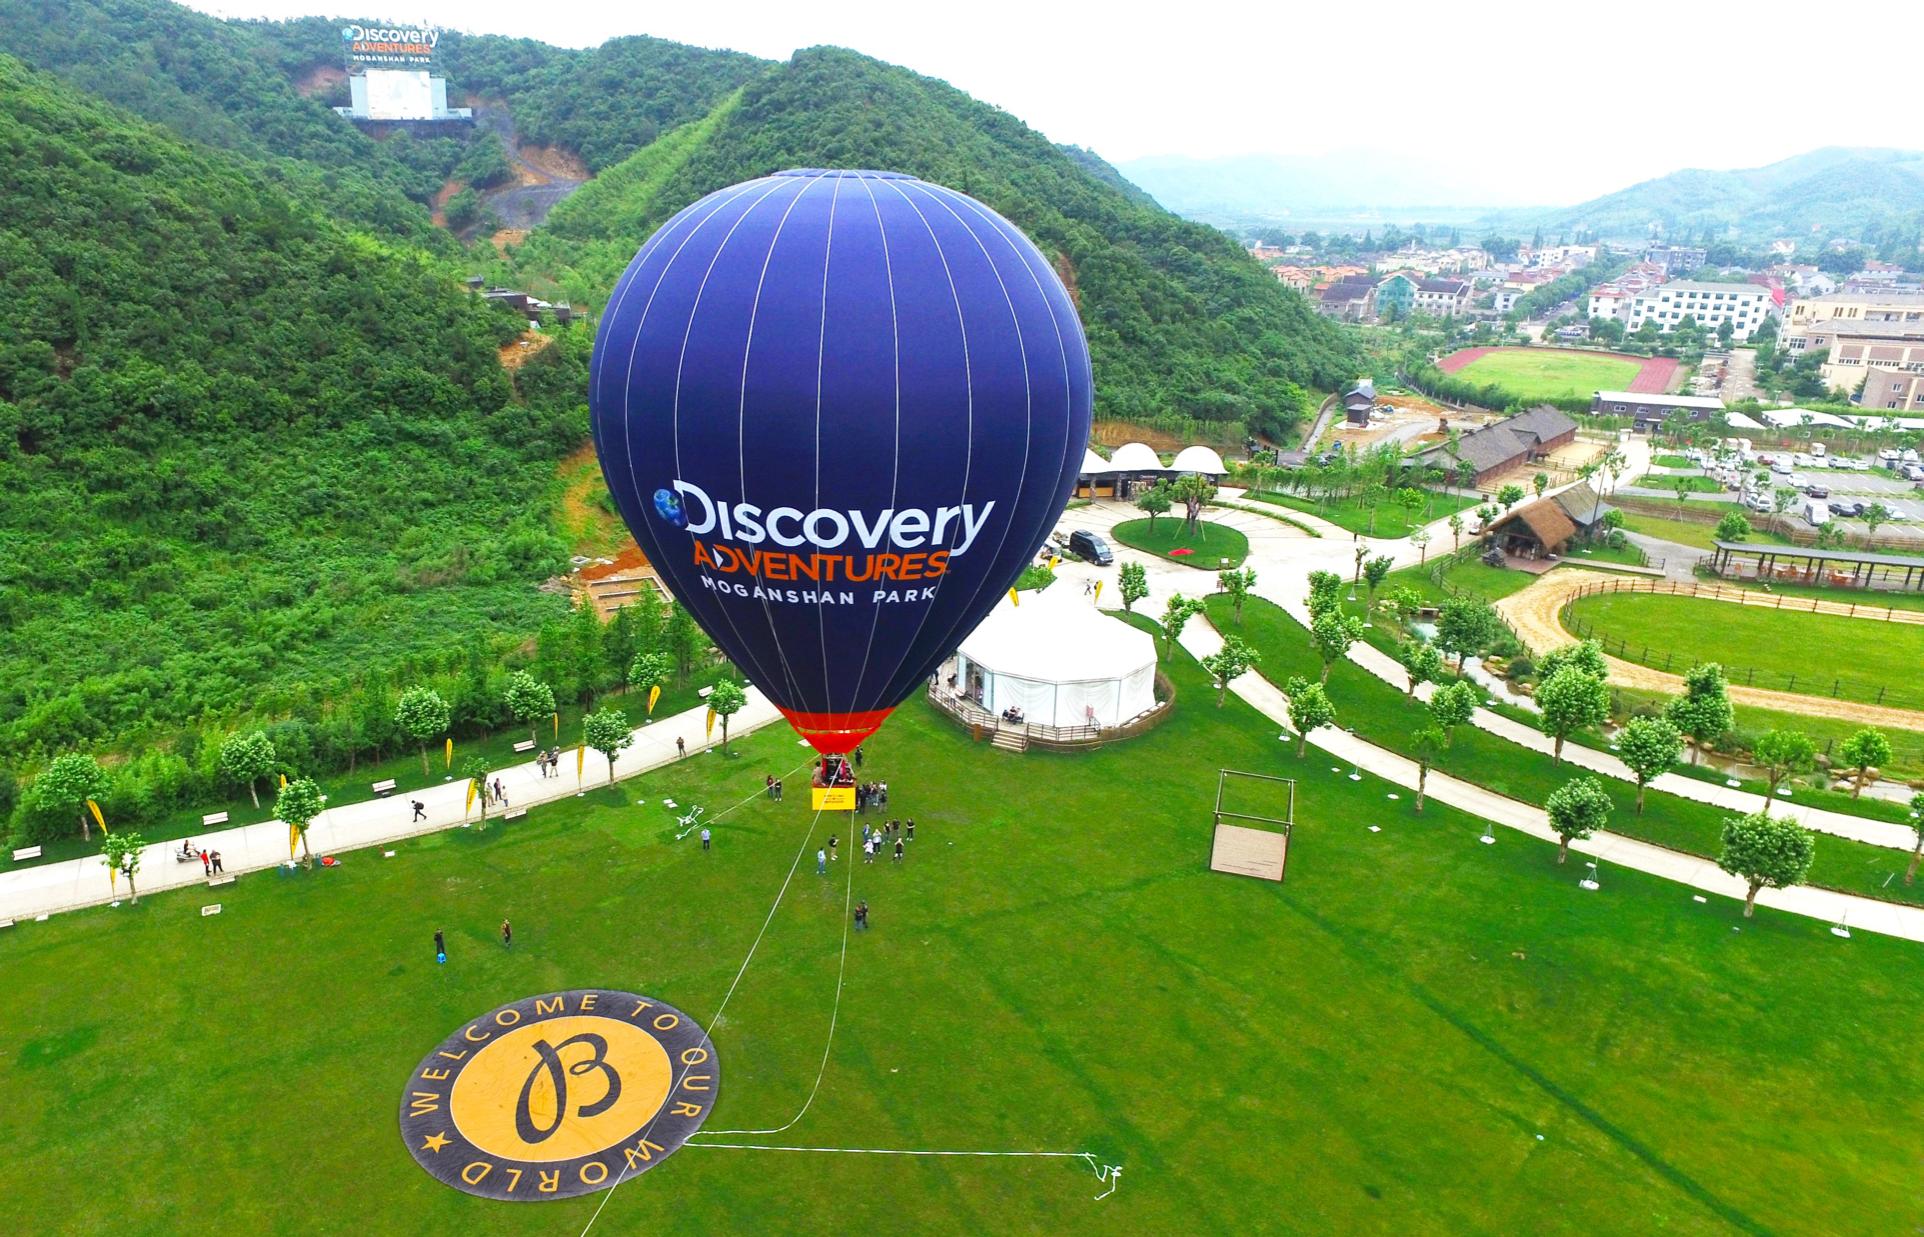 Discovery Adventures:在莫干山打造全球首个Discovery探索极限基地【InnoBrand 2016华丽集品牌创新大赛决赛选手专访】